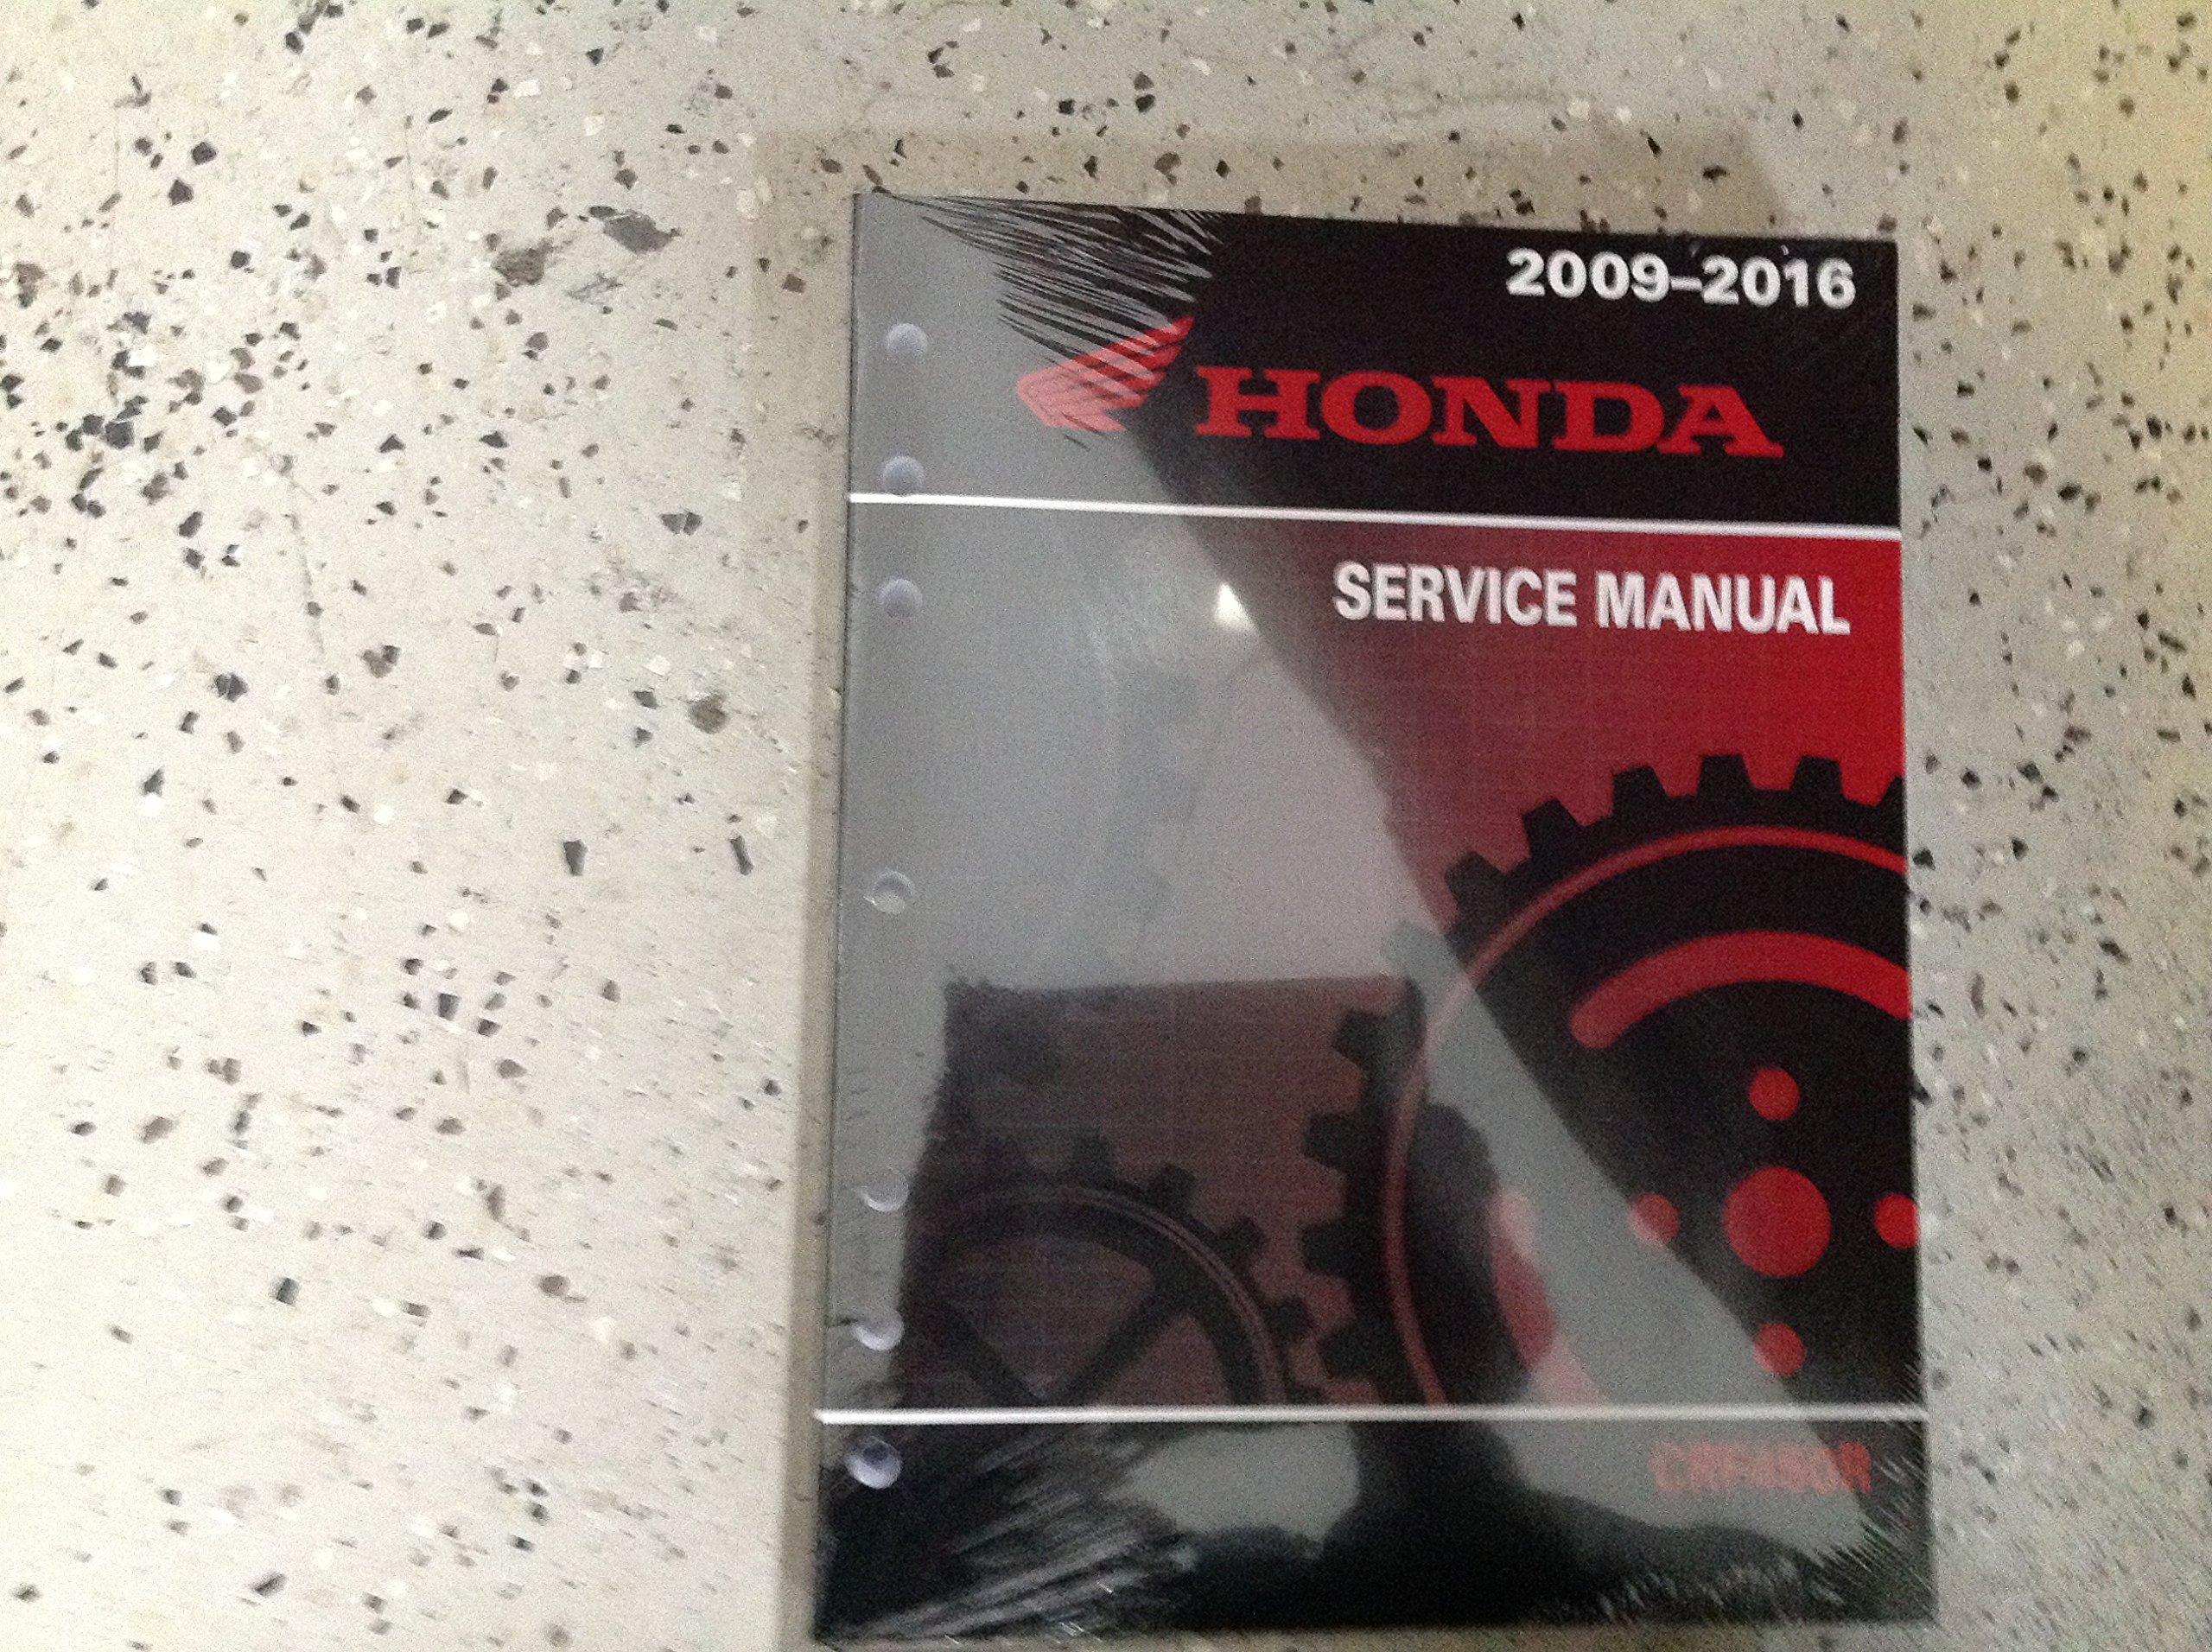 2014 2015 2016 HONDA CRF450R CRF 450 R Service Repair Workshop Shop Manual  NEW: HONDA: Amazon.com: Books